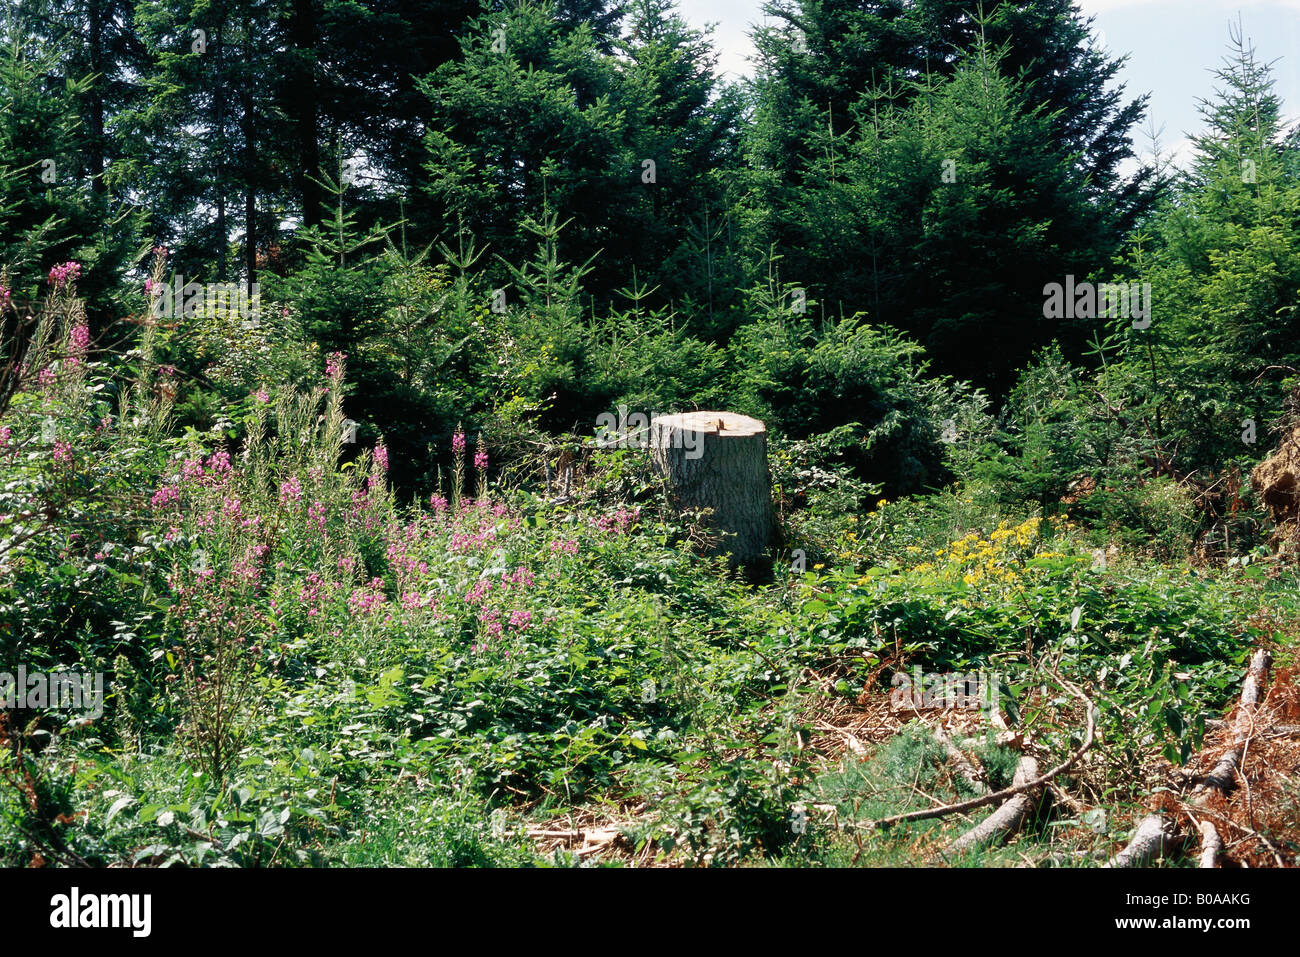 Tree stump in flowery meadow Stock Photo